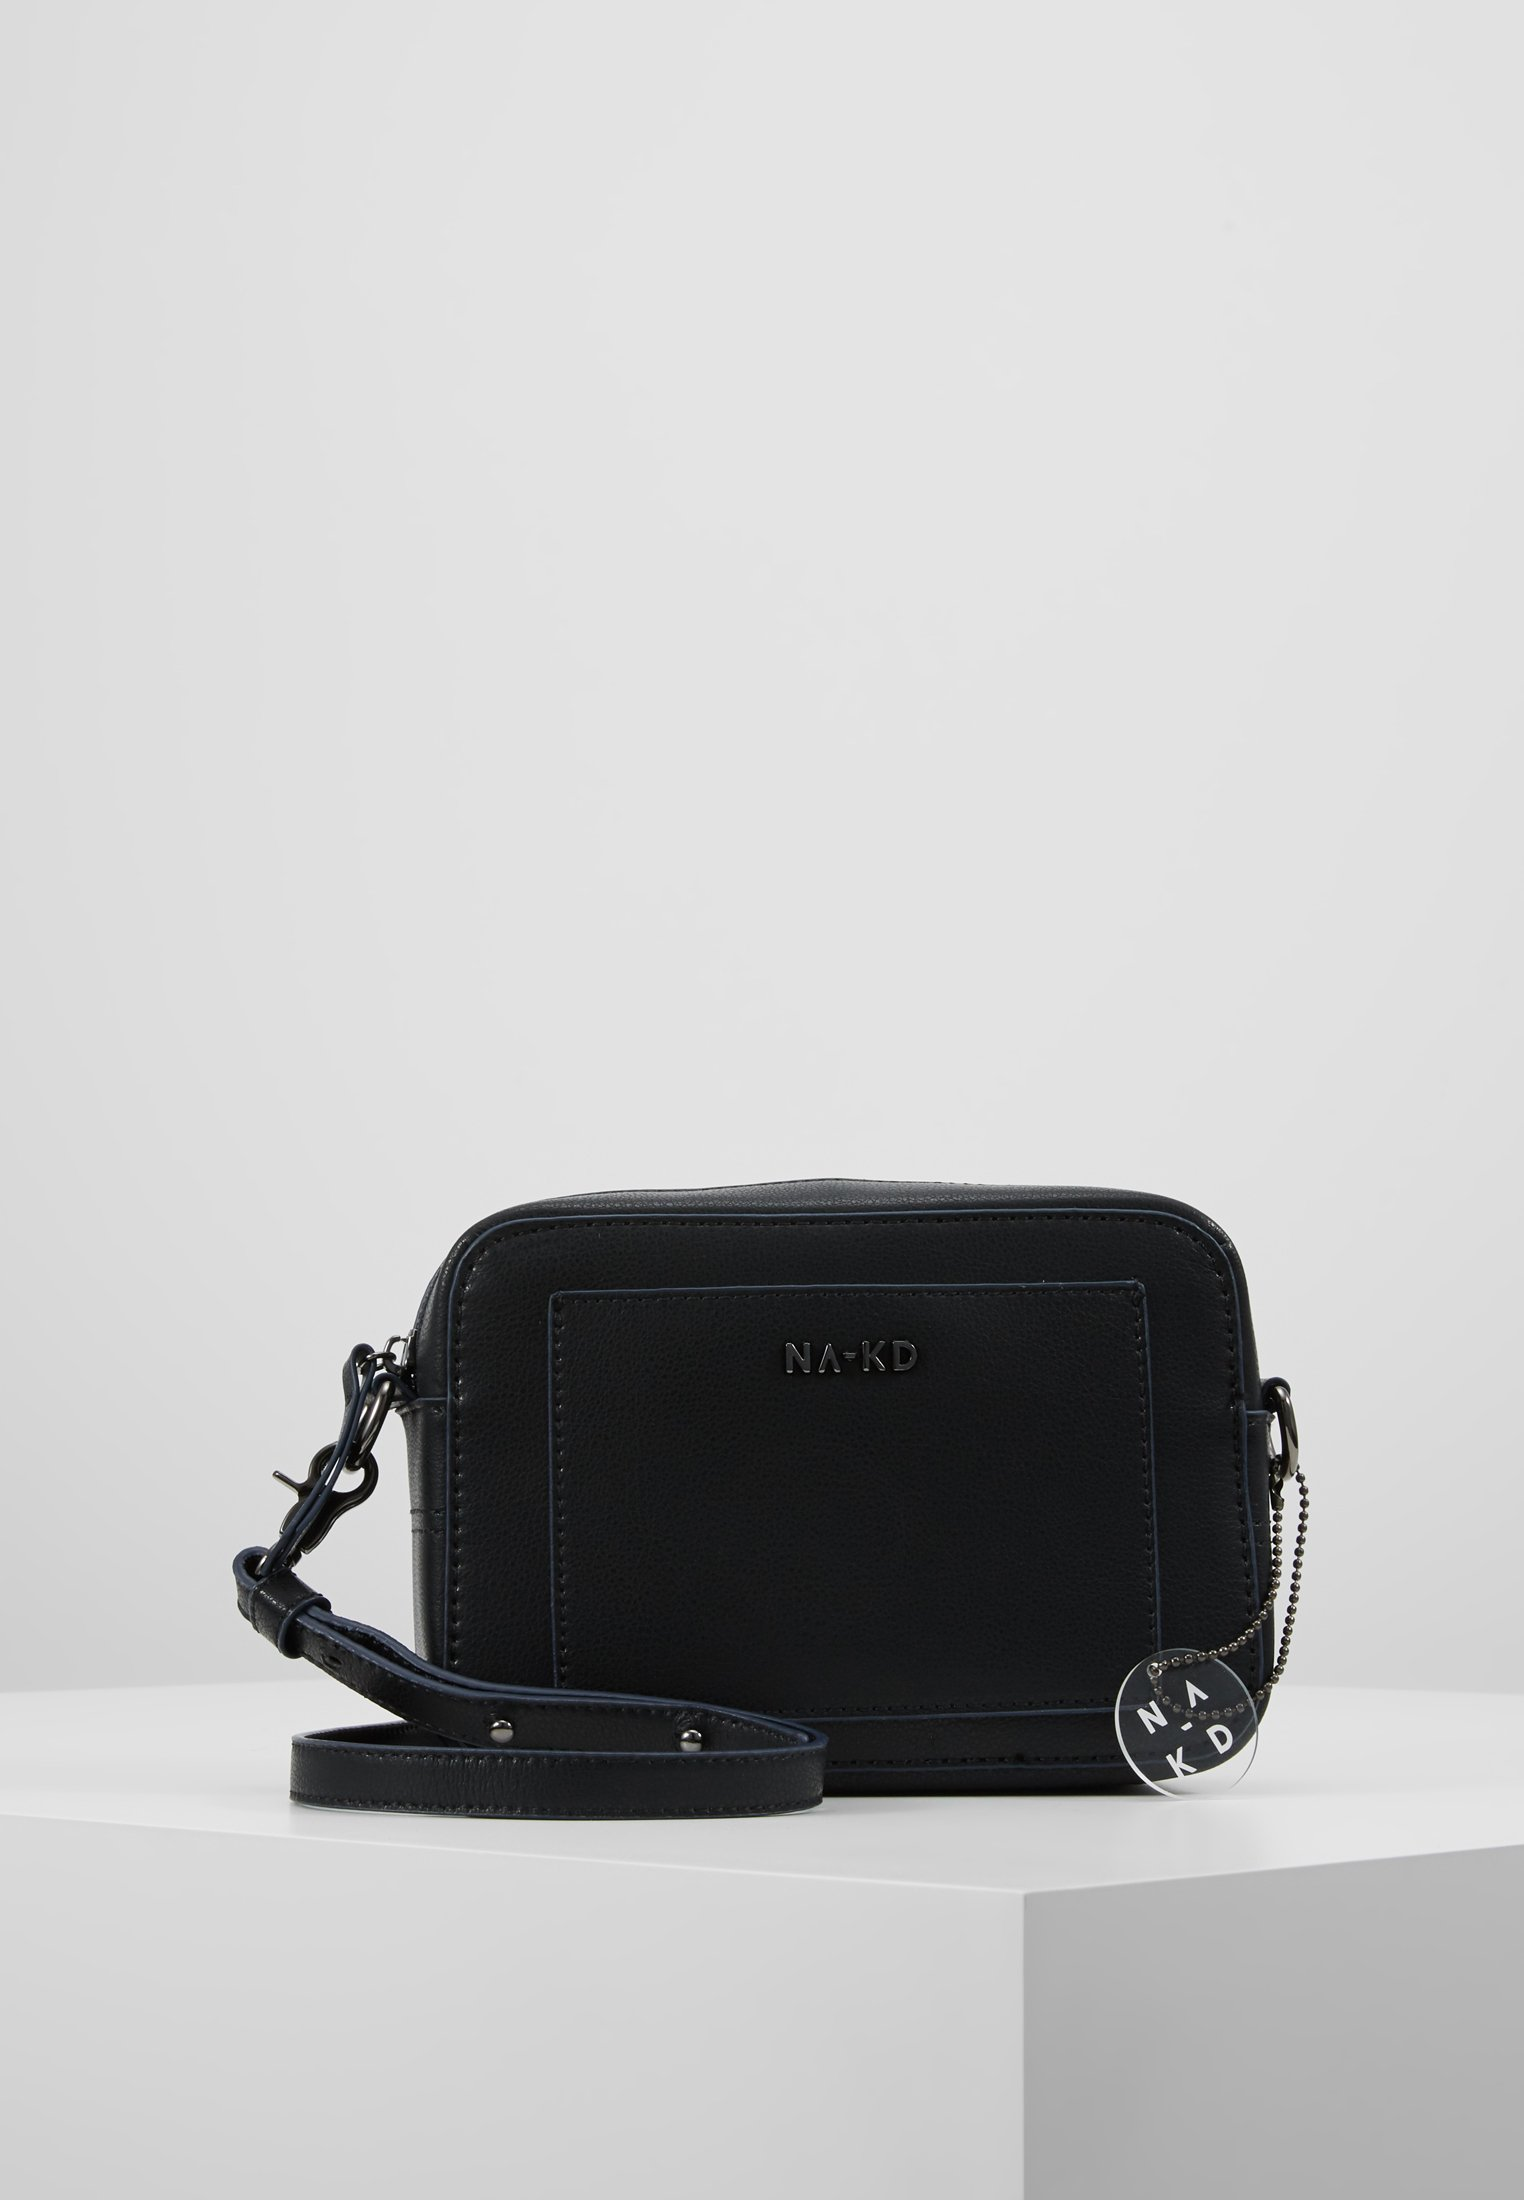 BagSac Na kd Bandoulière Minimalistic Black Shoulder nwP0Xk8O